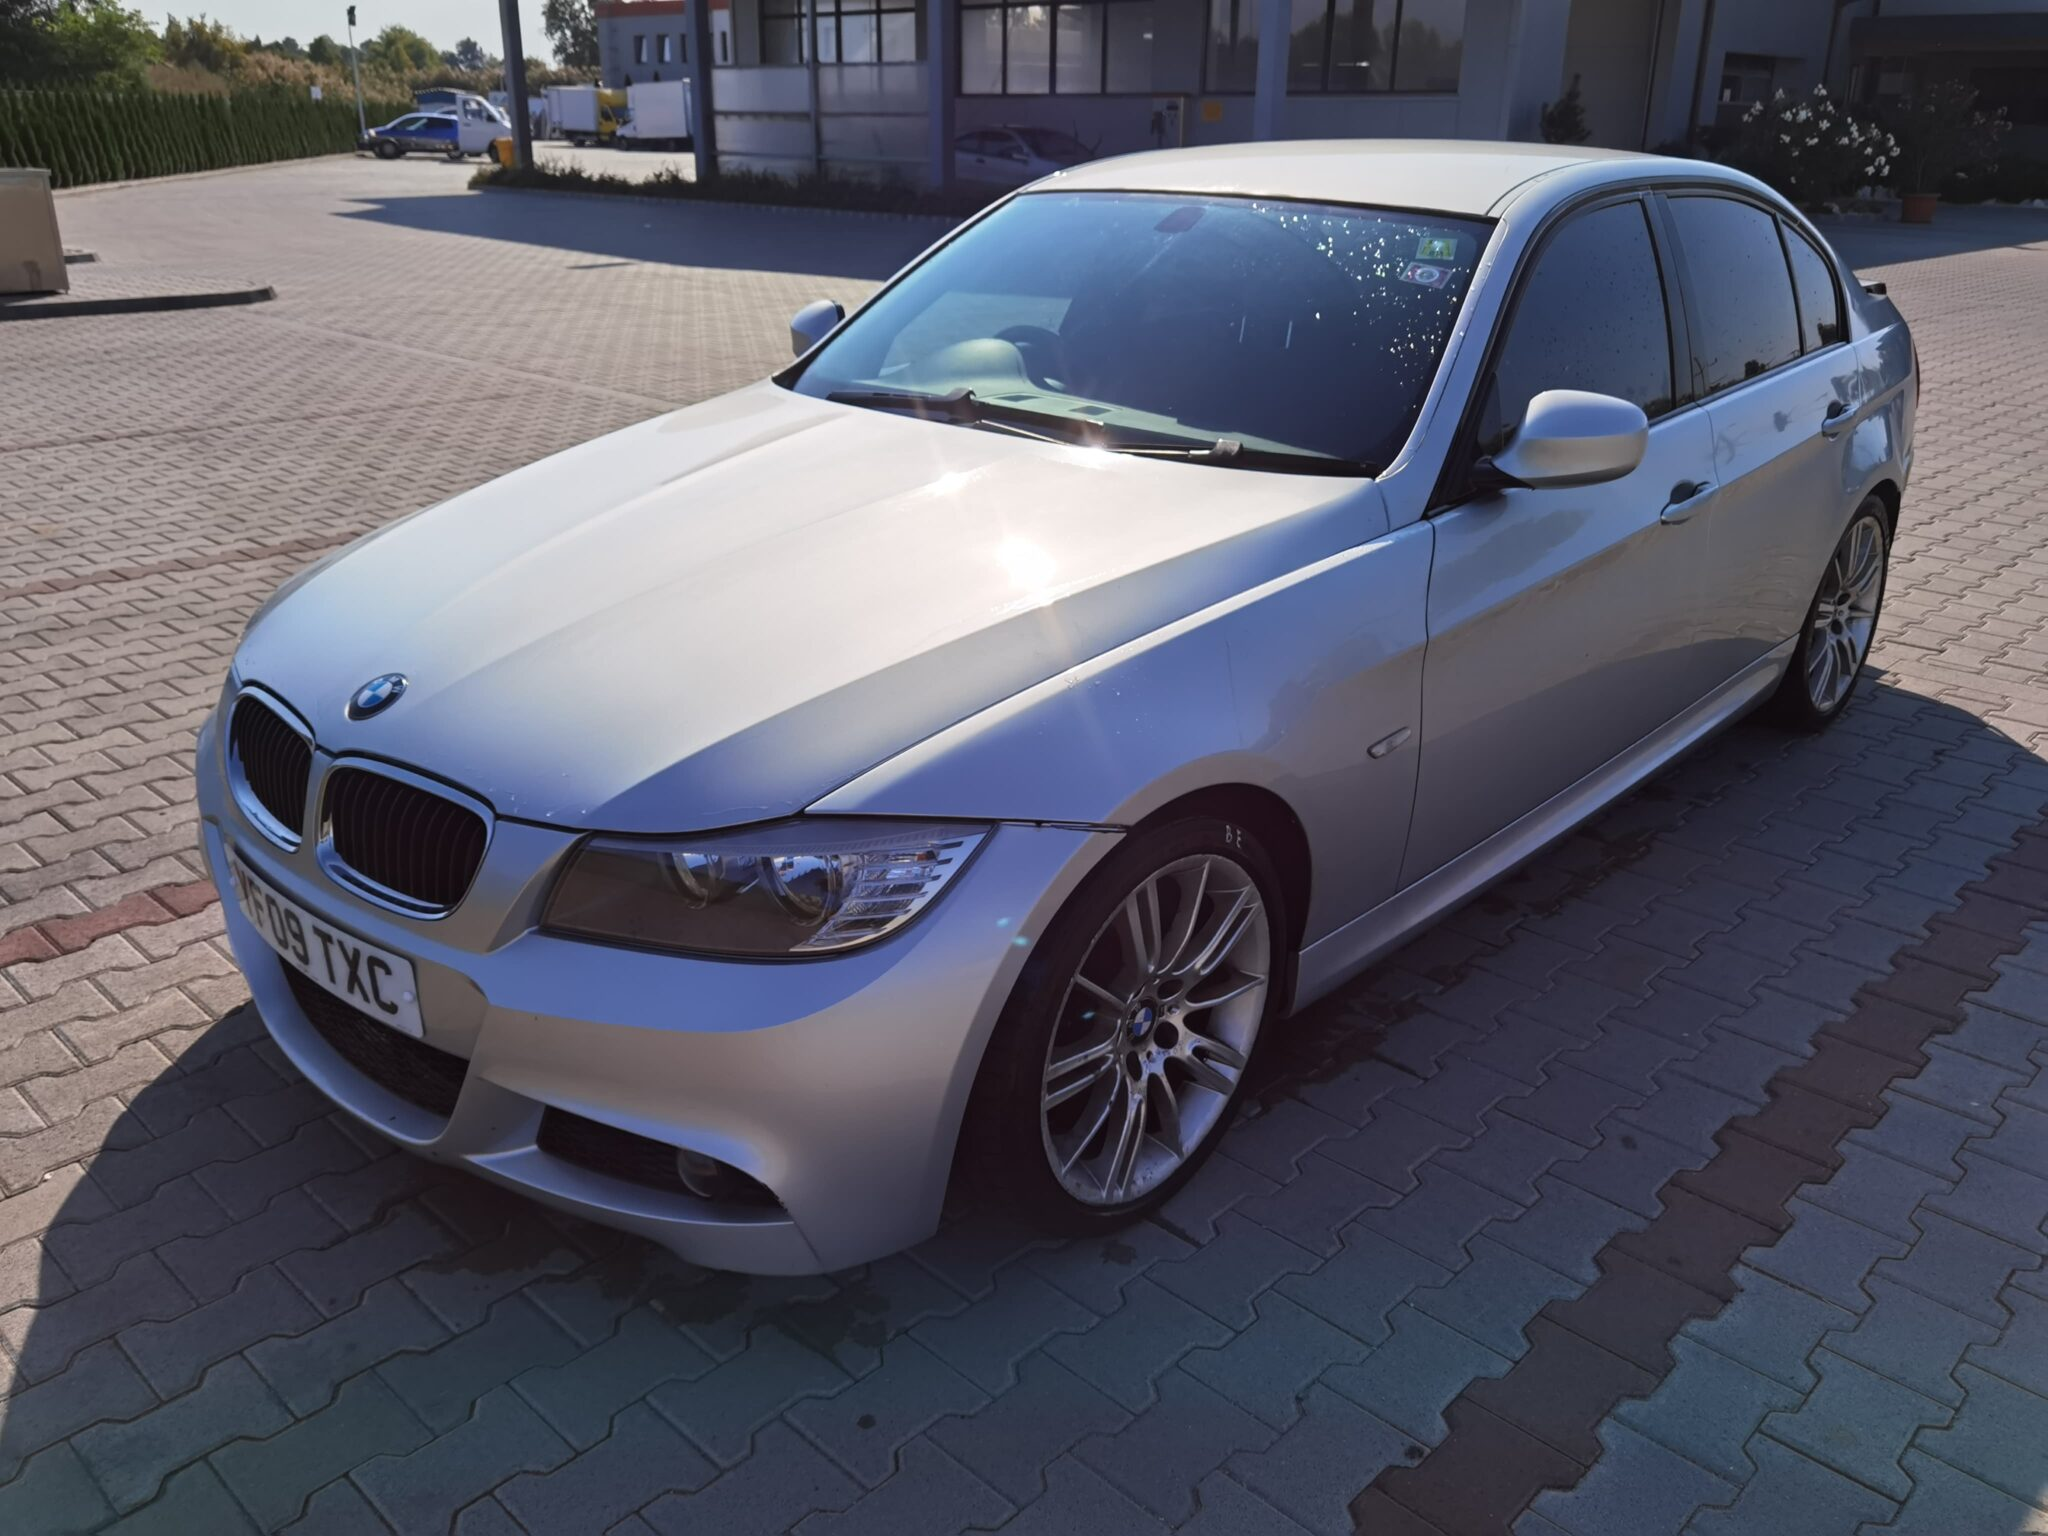 BMW E90 lci 318d Carbon Car Center Békéscsaba-4